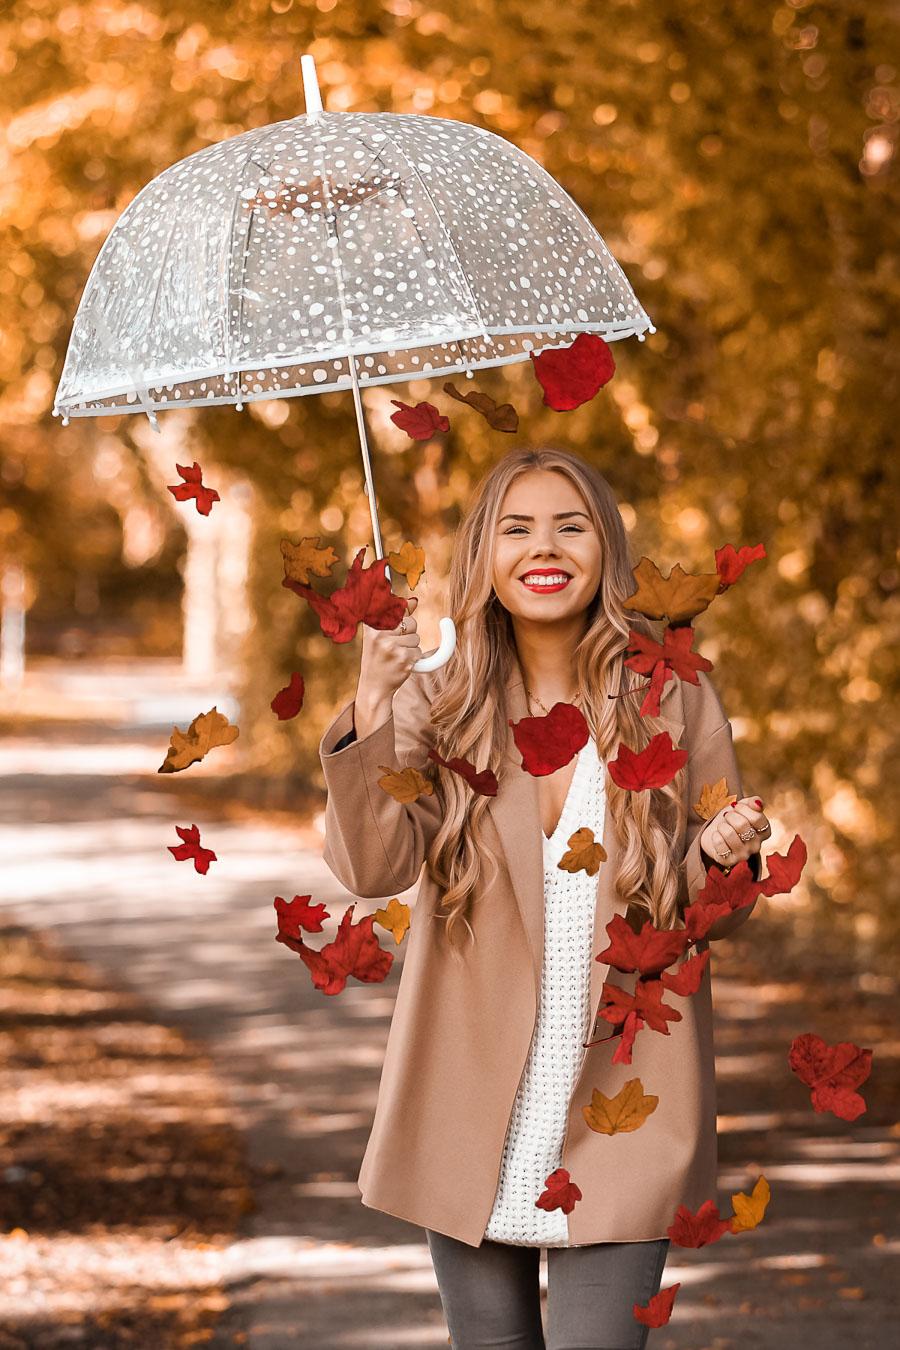 Regenschirm aus dem bunte Herbstblätter fallen